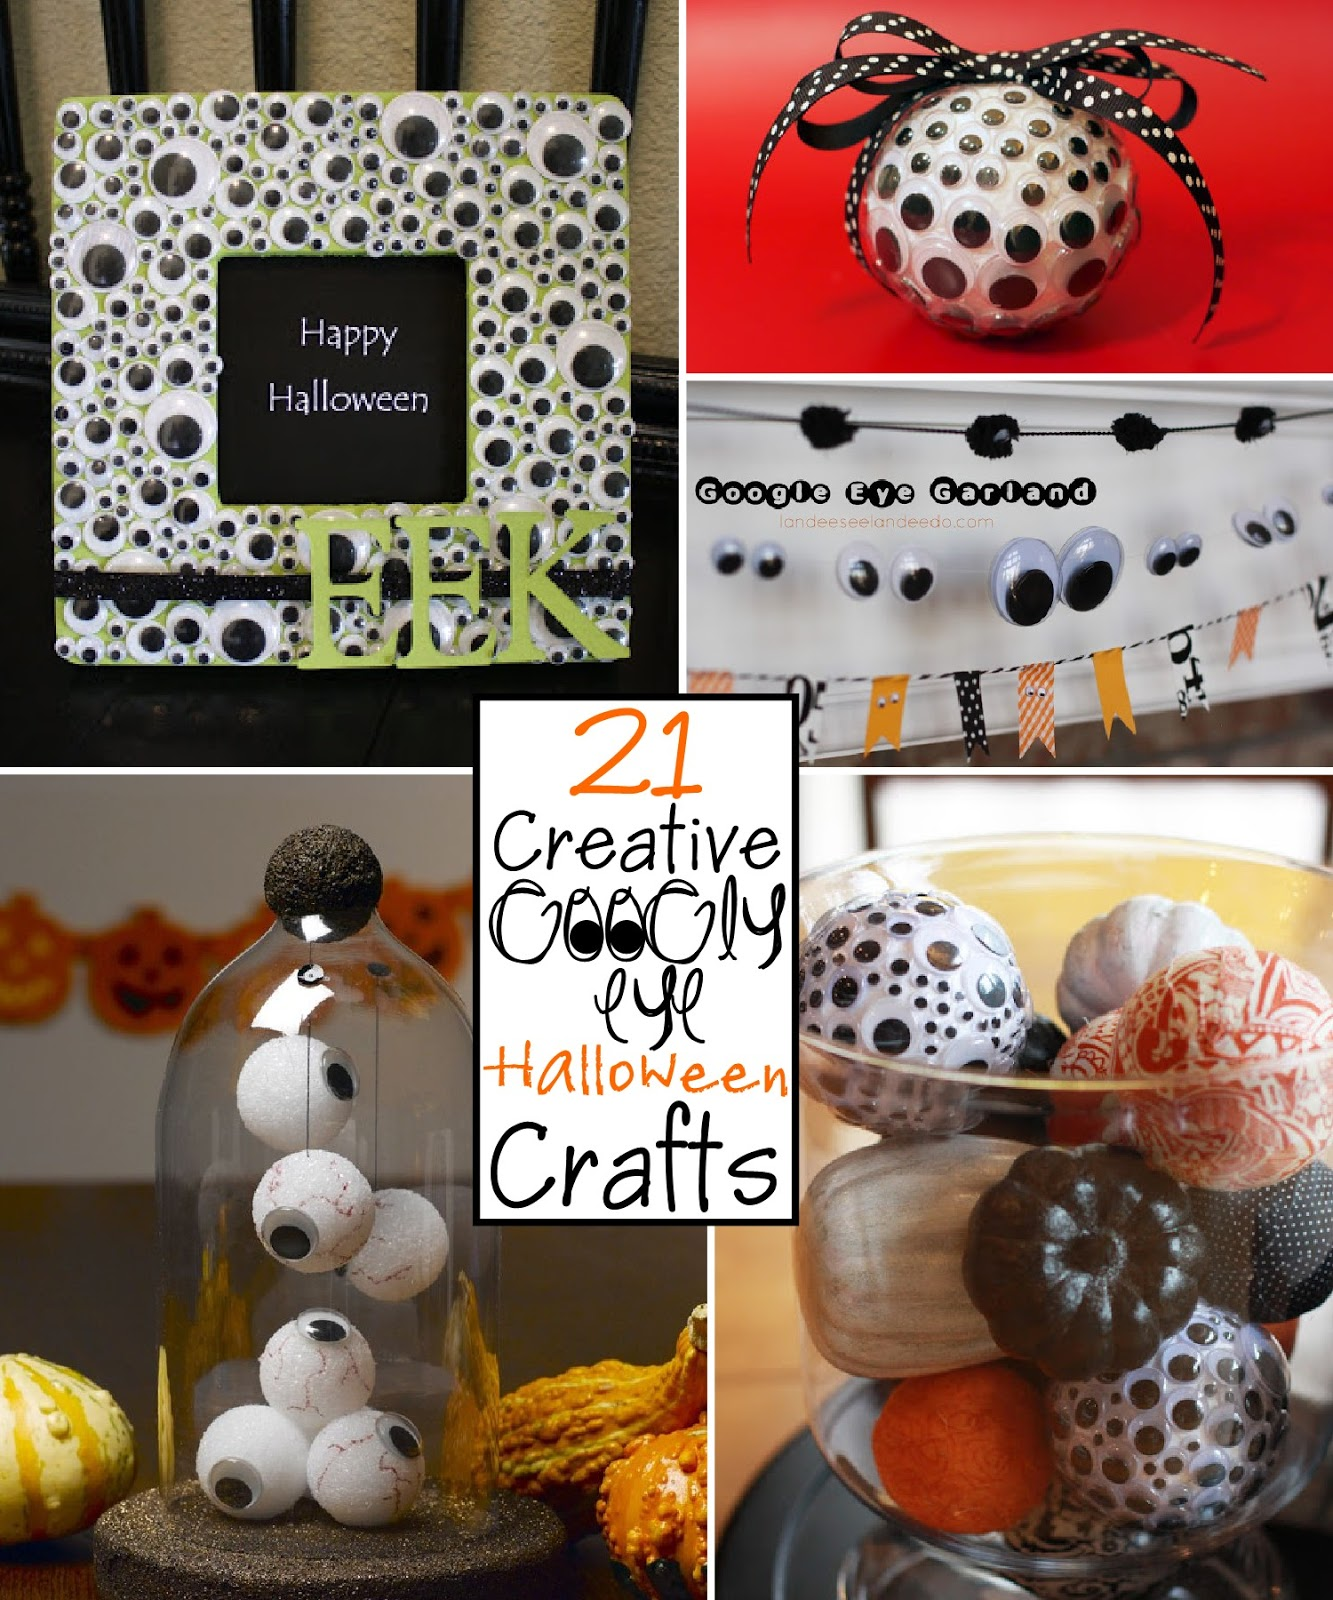 Creative Halloween Decoration Ideas: 21 Creative Googly Eye Halloween Crafts